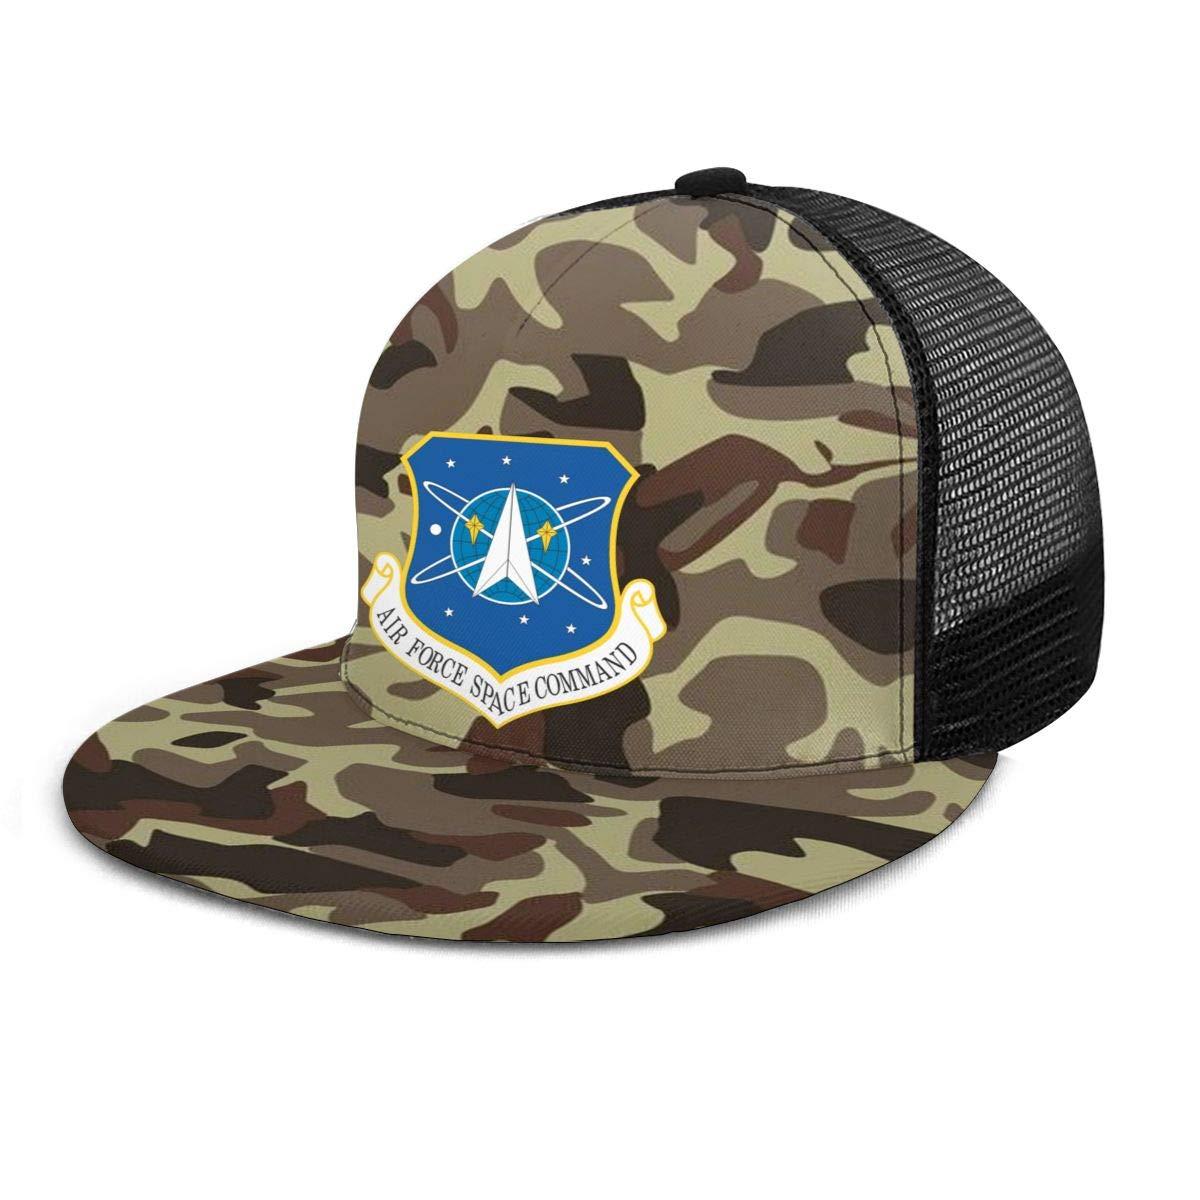 Air Force Space Command Classic Grid Hop Flat Along Baseball Hats Snapback Men Women Caps Adjustable